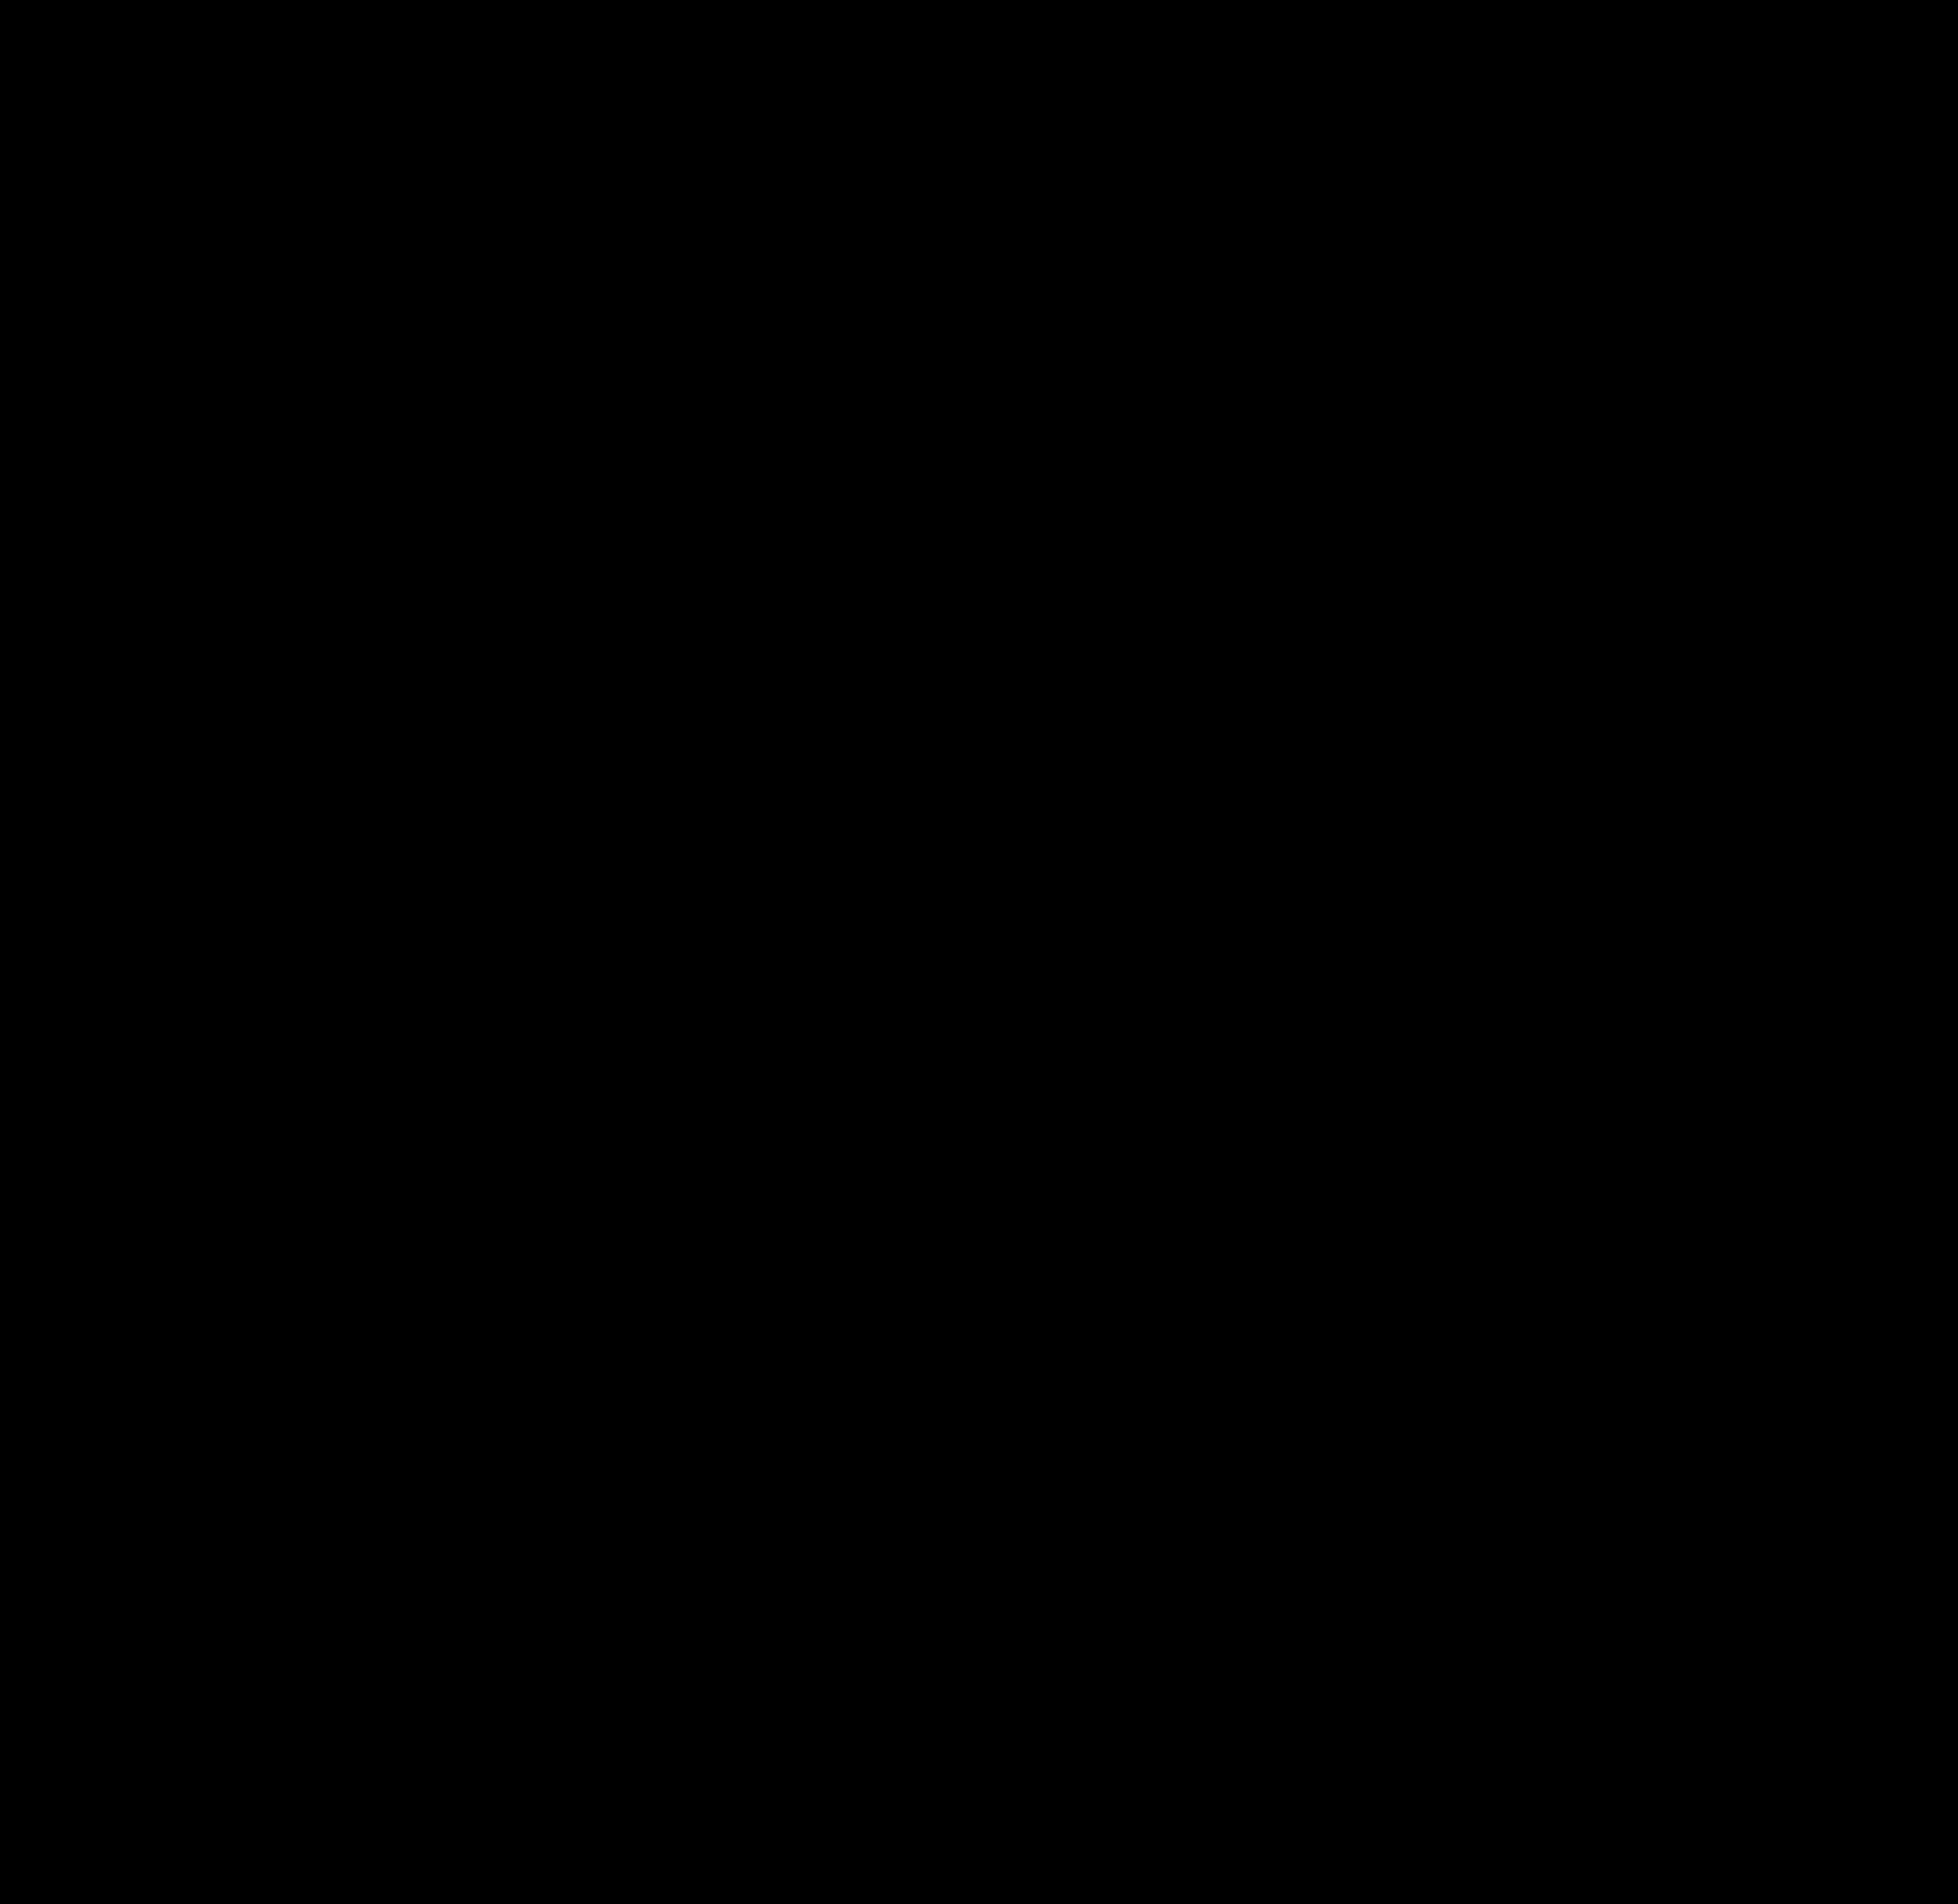 2000x1945 Adidas Logo Png